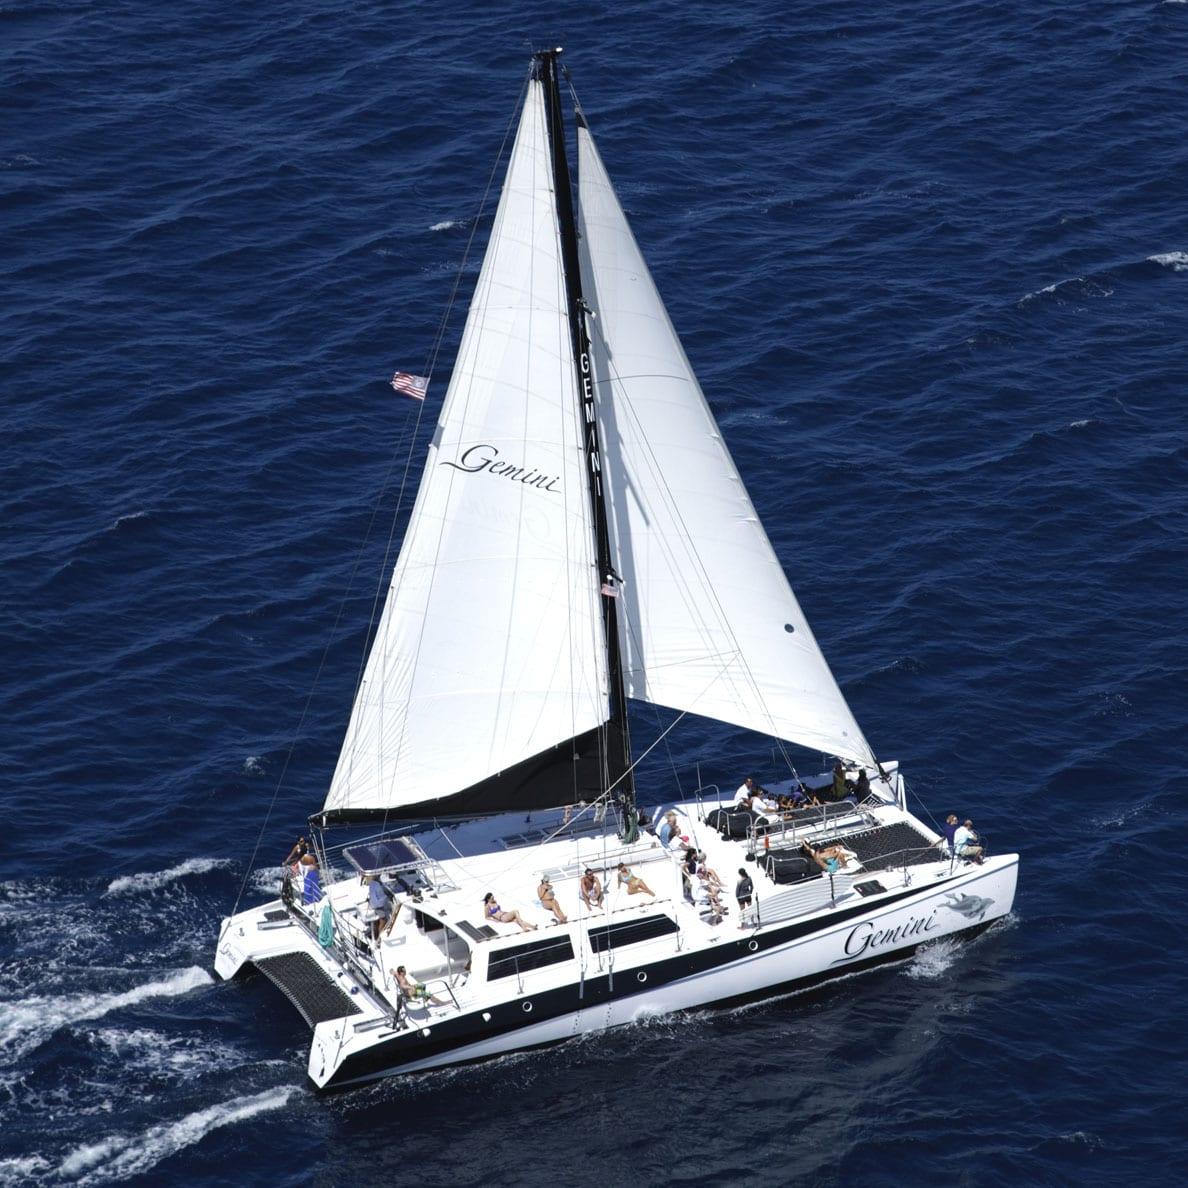 Gemini Charters – Whale Watching Sail